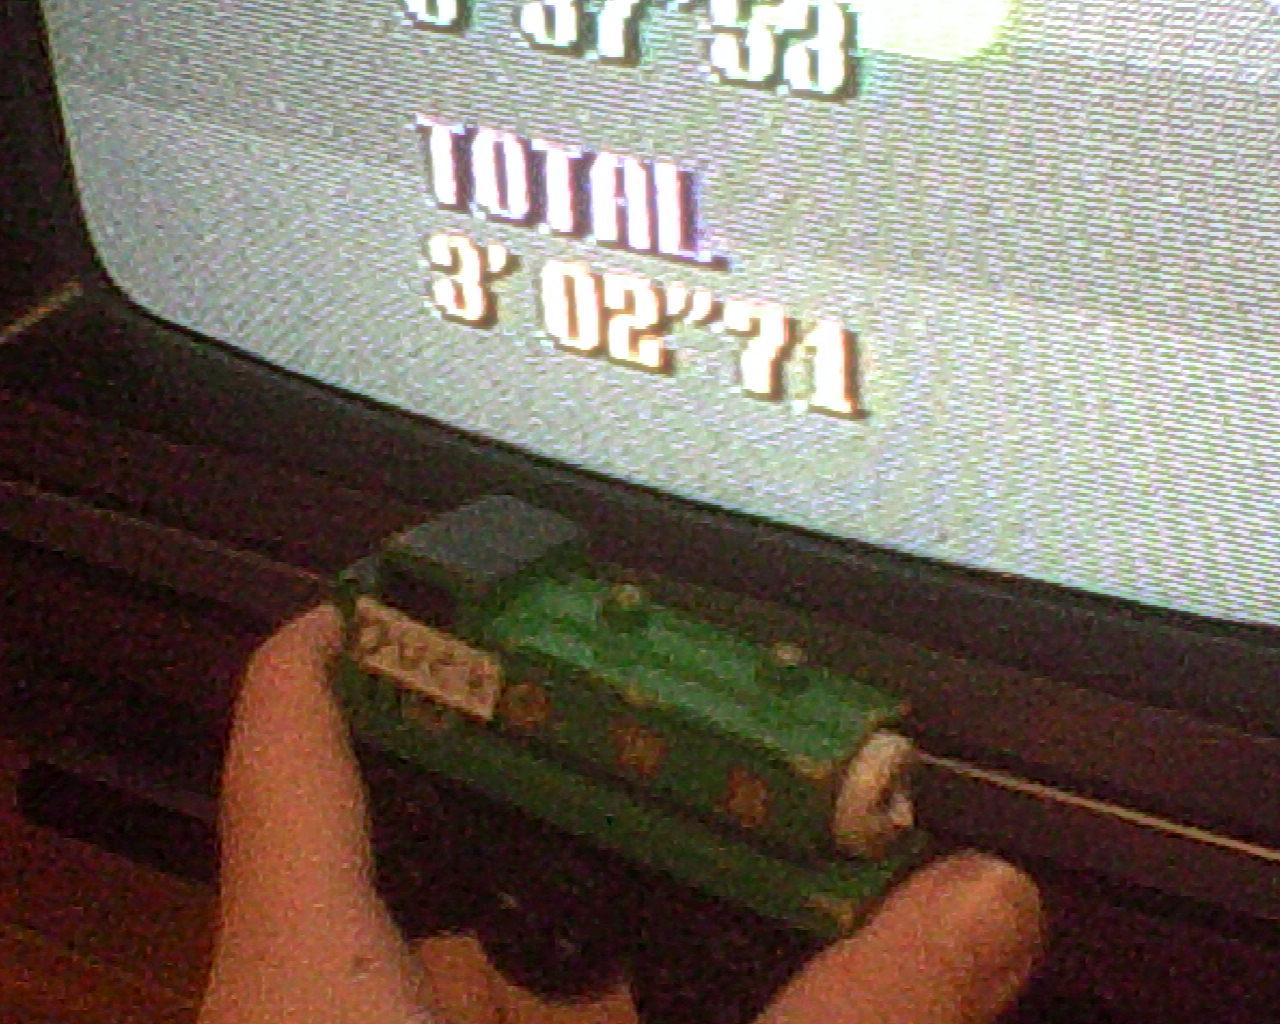 DuckGWR: F-Zero: Sand Ocean [Beginner] (SNES/Super Famicom) 0:03:02.71 points on 2014-12-22 18:24:56